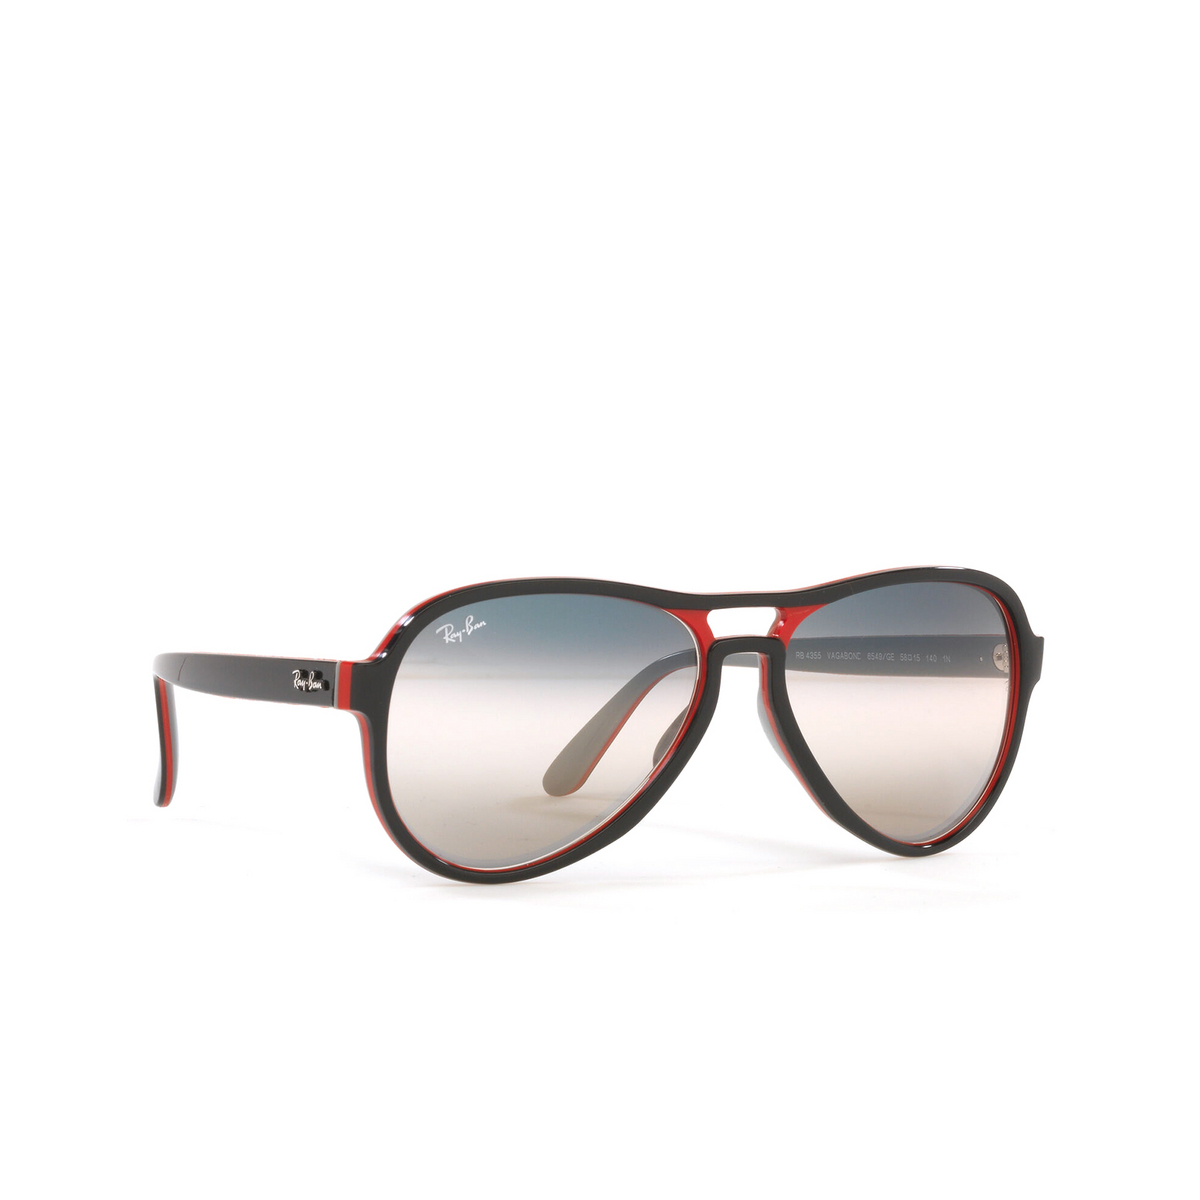 Ray-Ban® Aviator Sunglasses: Vagabond RB4355 color Black Red Light Grey 6549GE - three-quarters view.